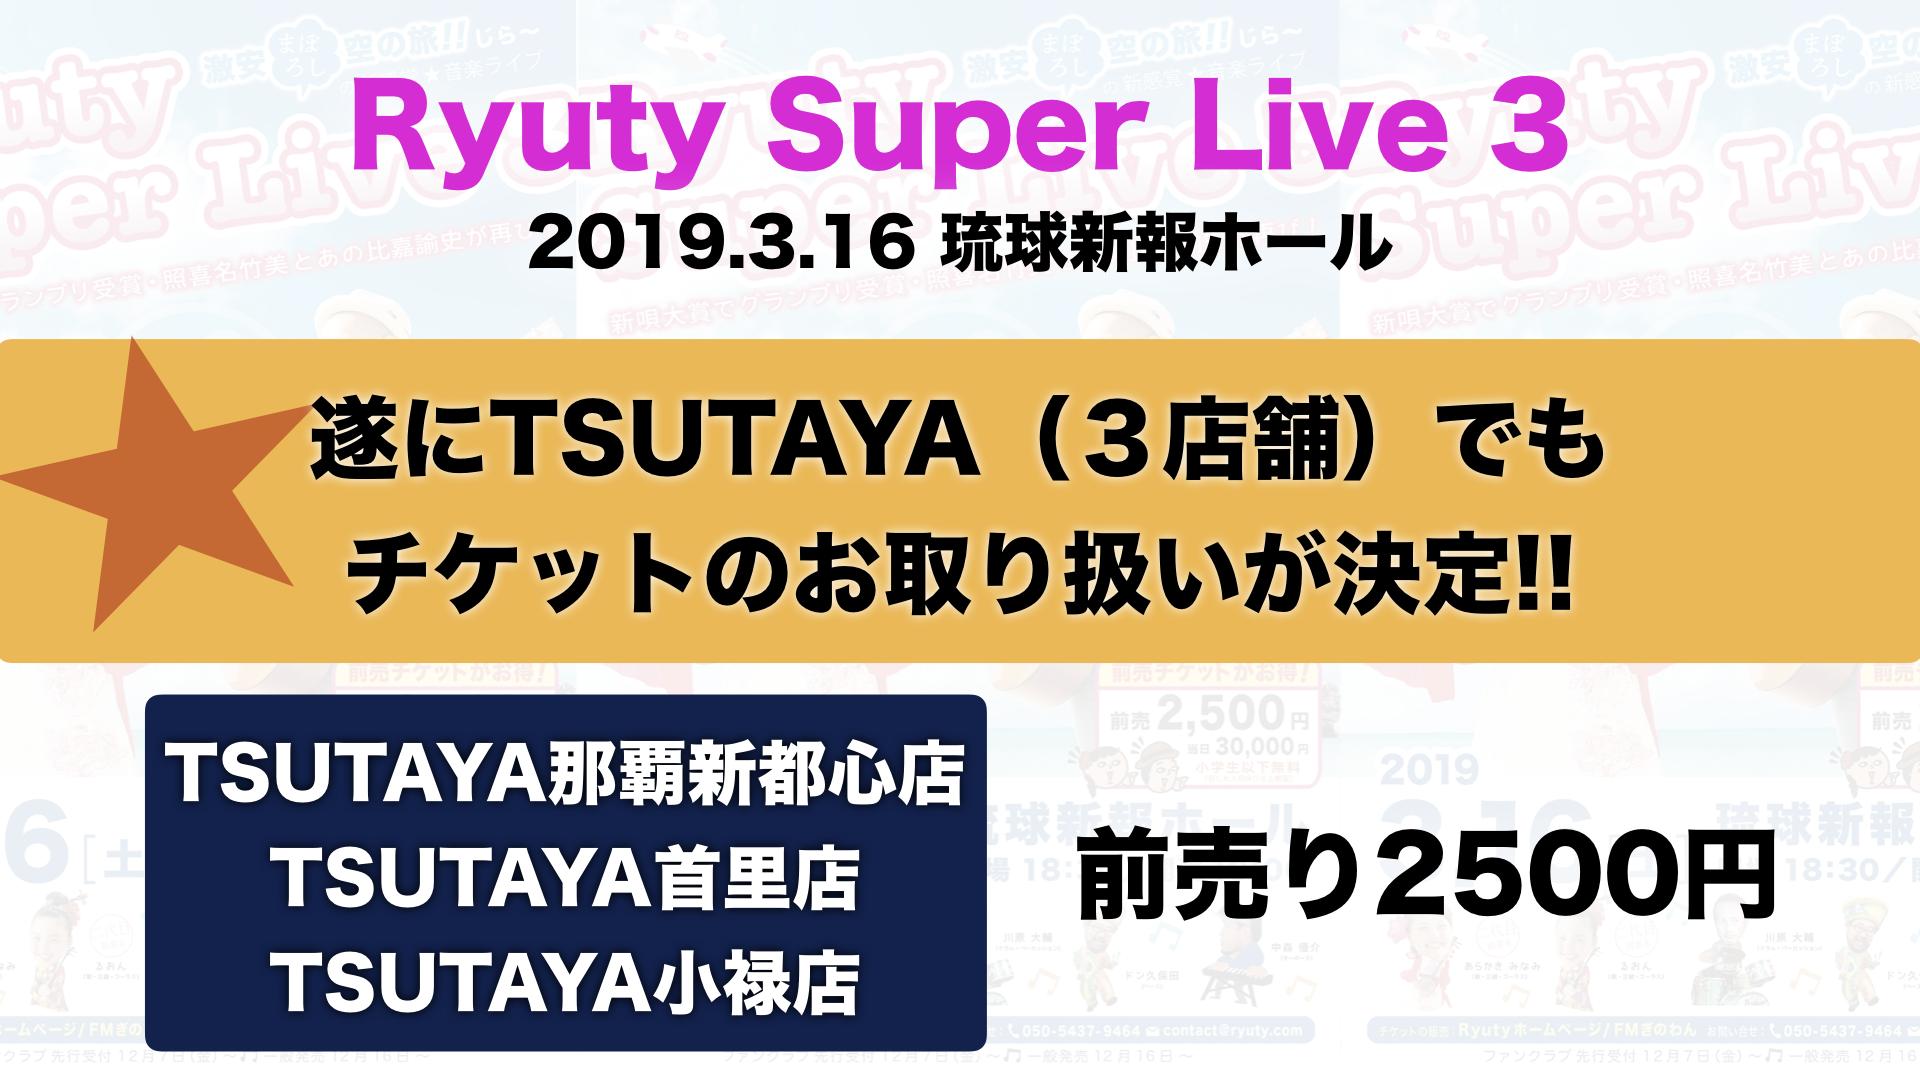 TSUTAYA告知.001